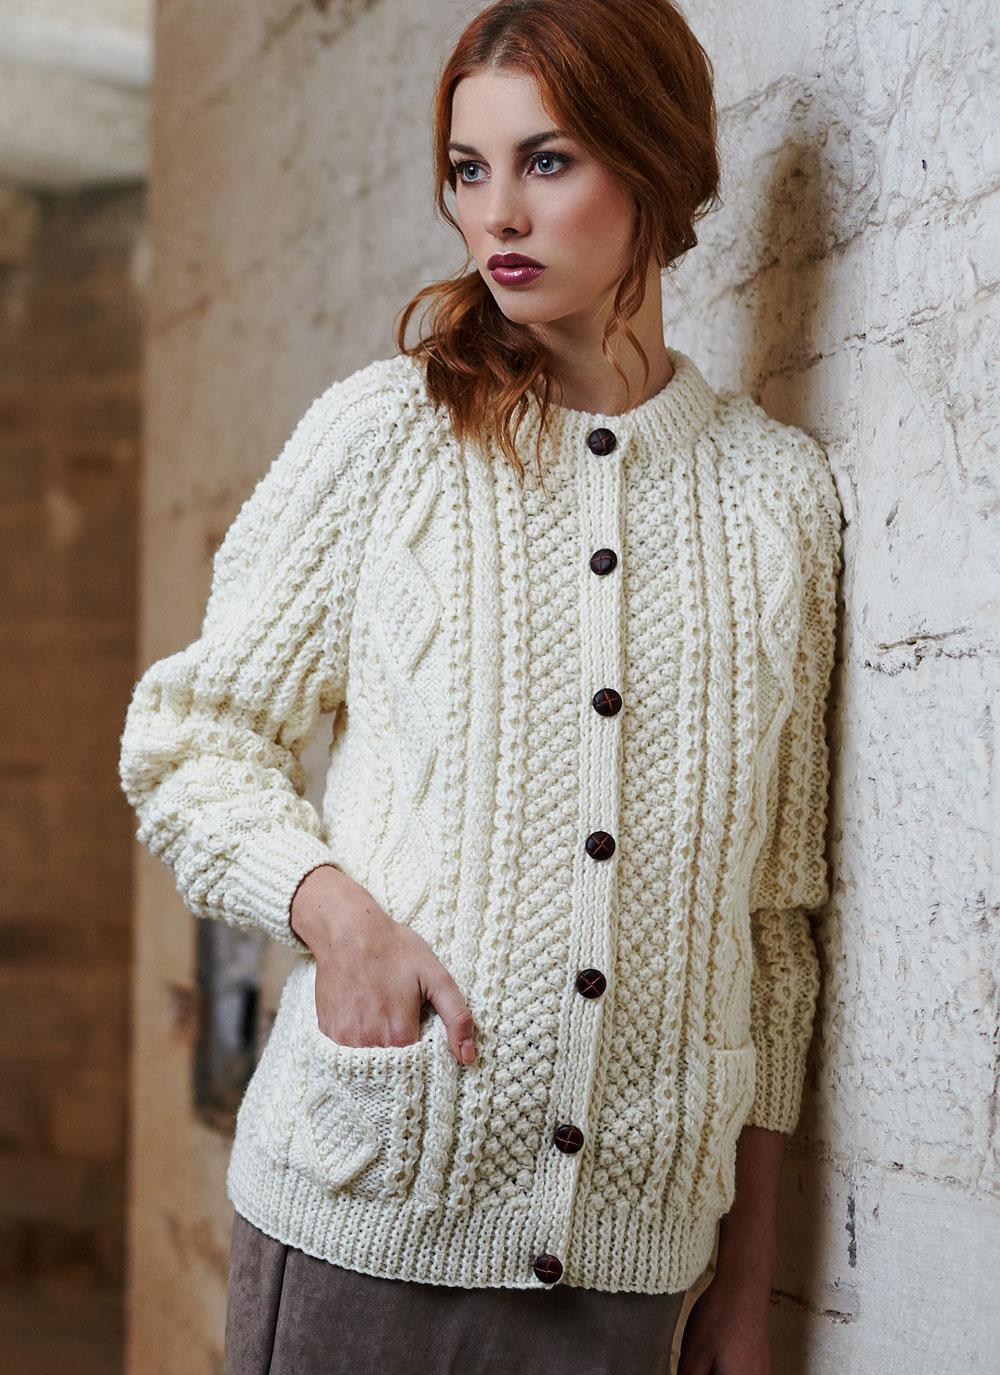 Hand Knitting Patterns For Ladies Cardigans : Ladies Hand Knit Aran Lumber Blarney